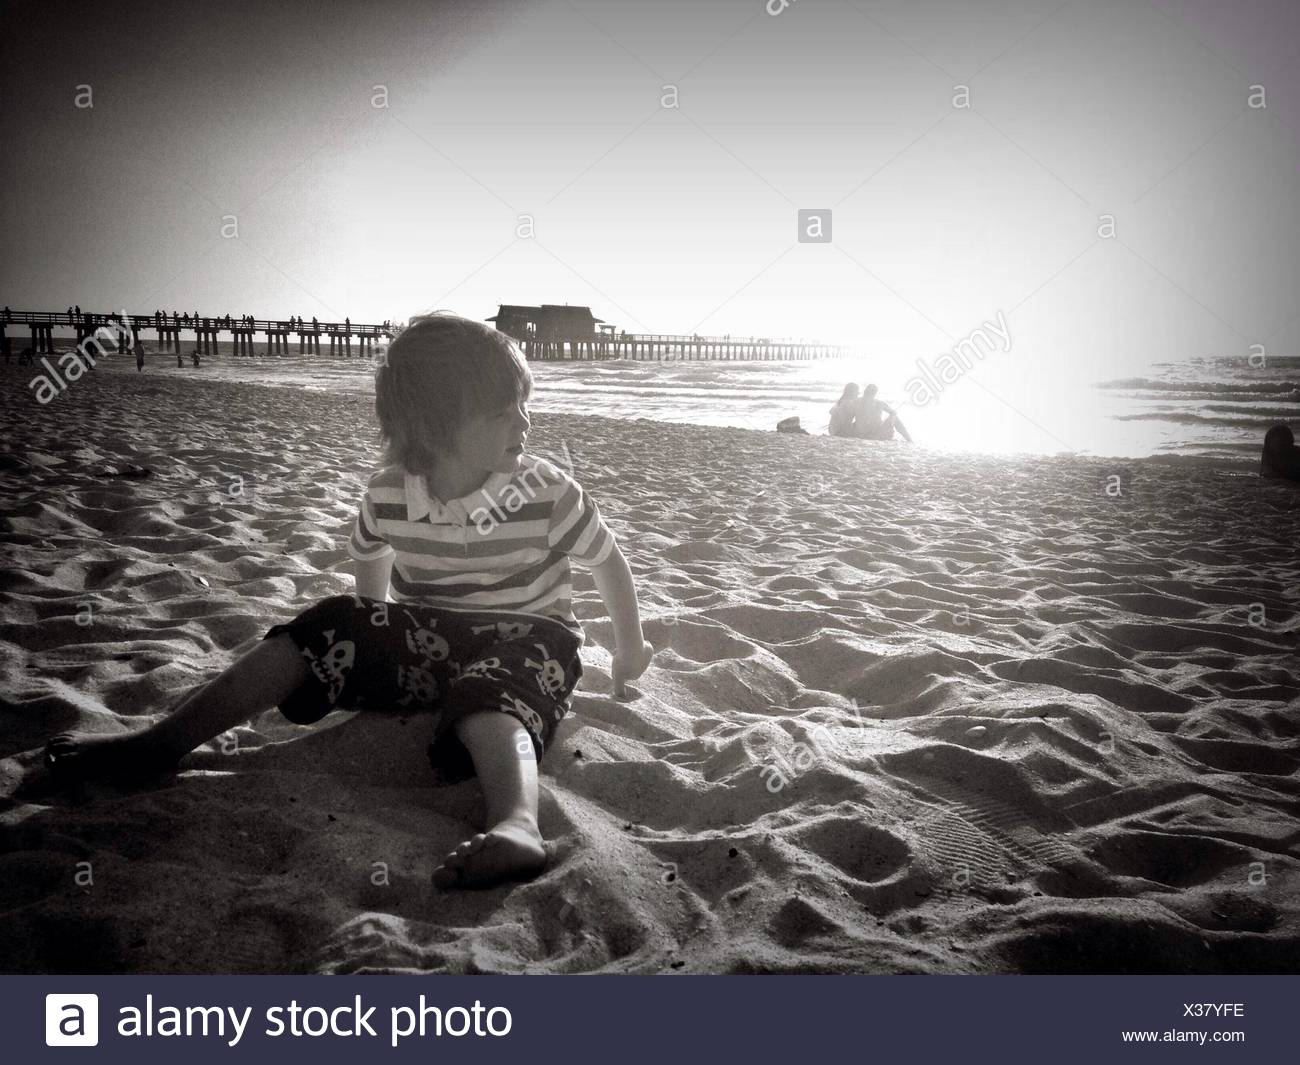 Boy Sitting On Beach Photo Stock